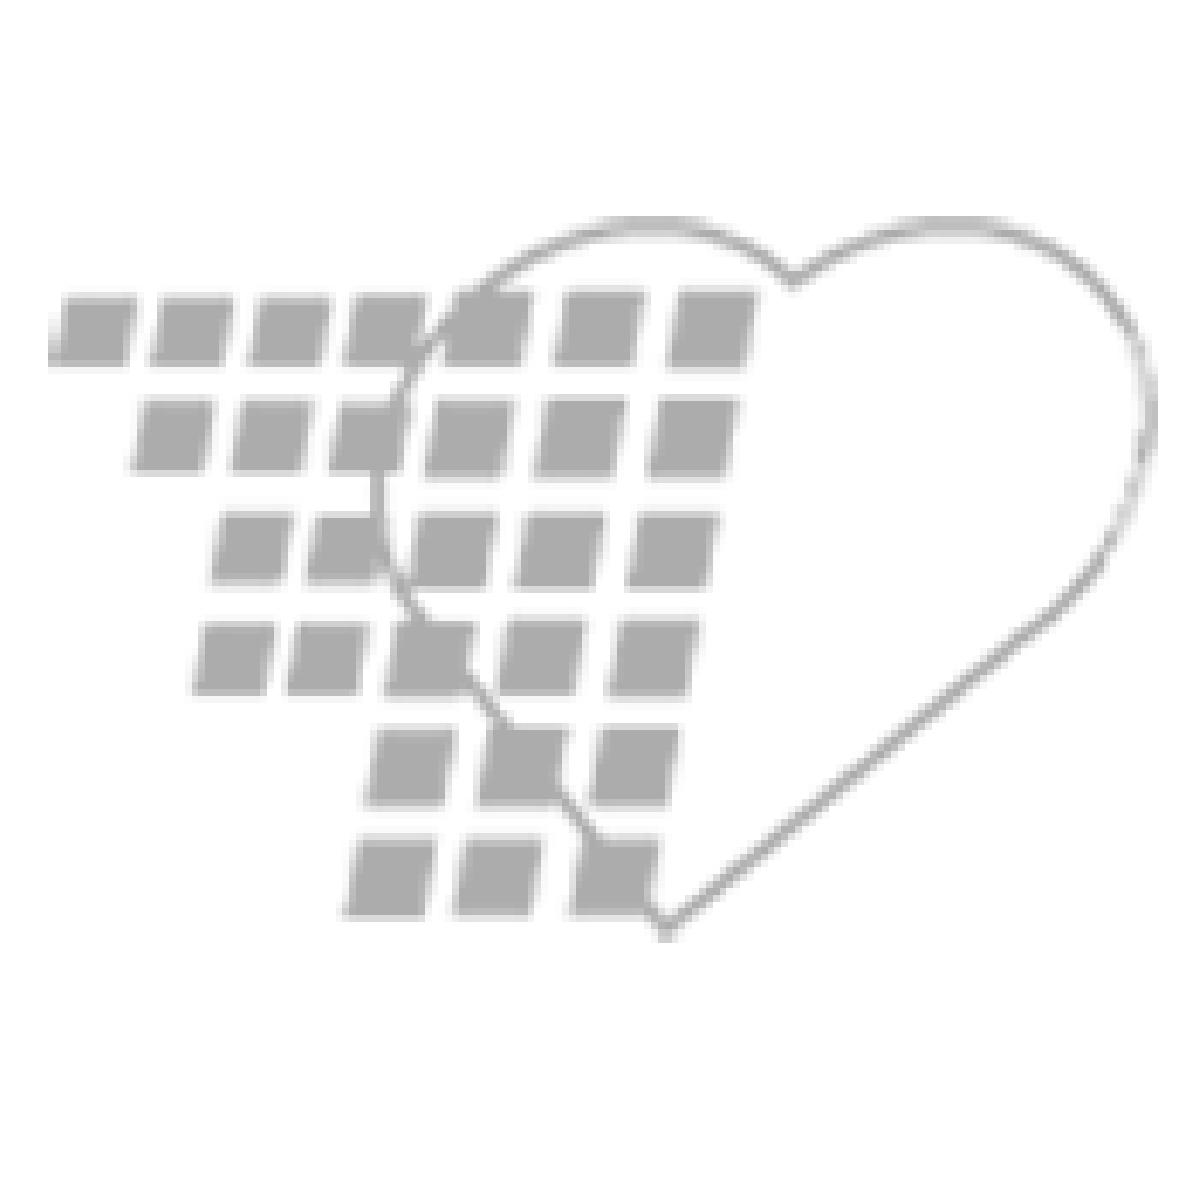 06-93-1104 - Demo Dose® Calcim Chlorid 10mL syringe